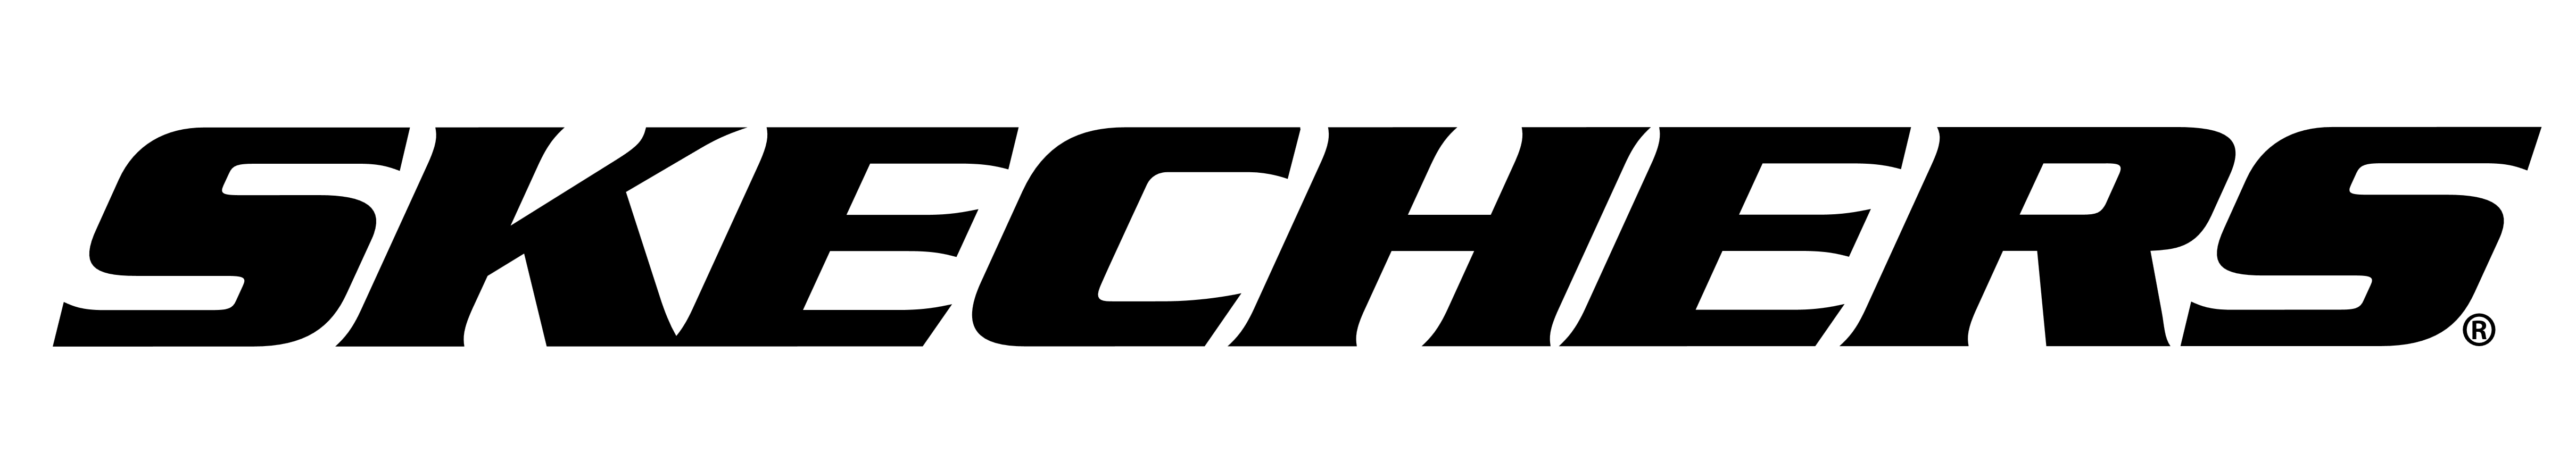 Skechers – Logos Download - Skechers Logo PNG